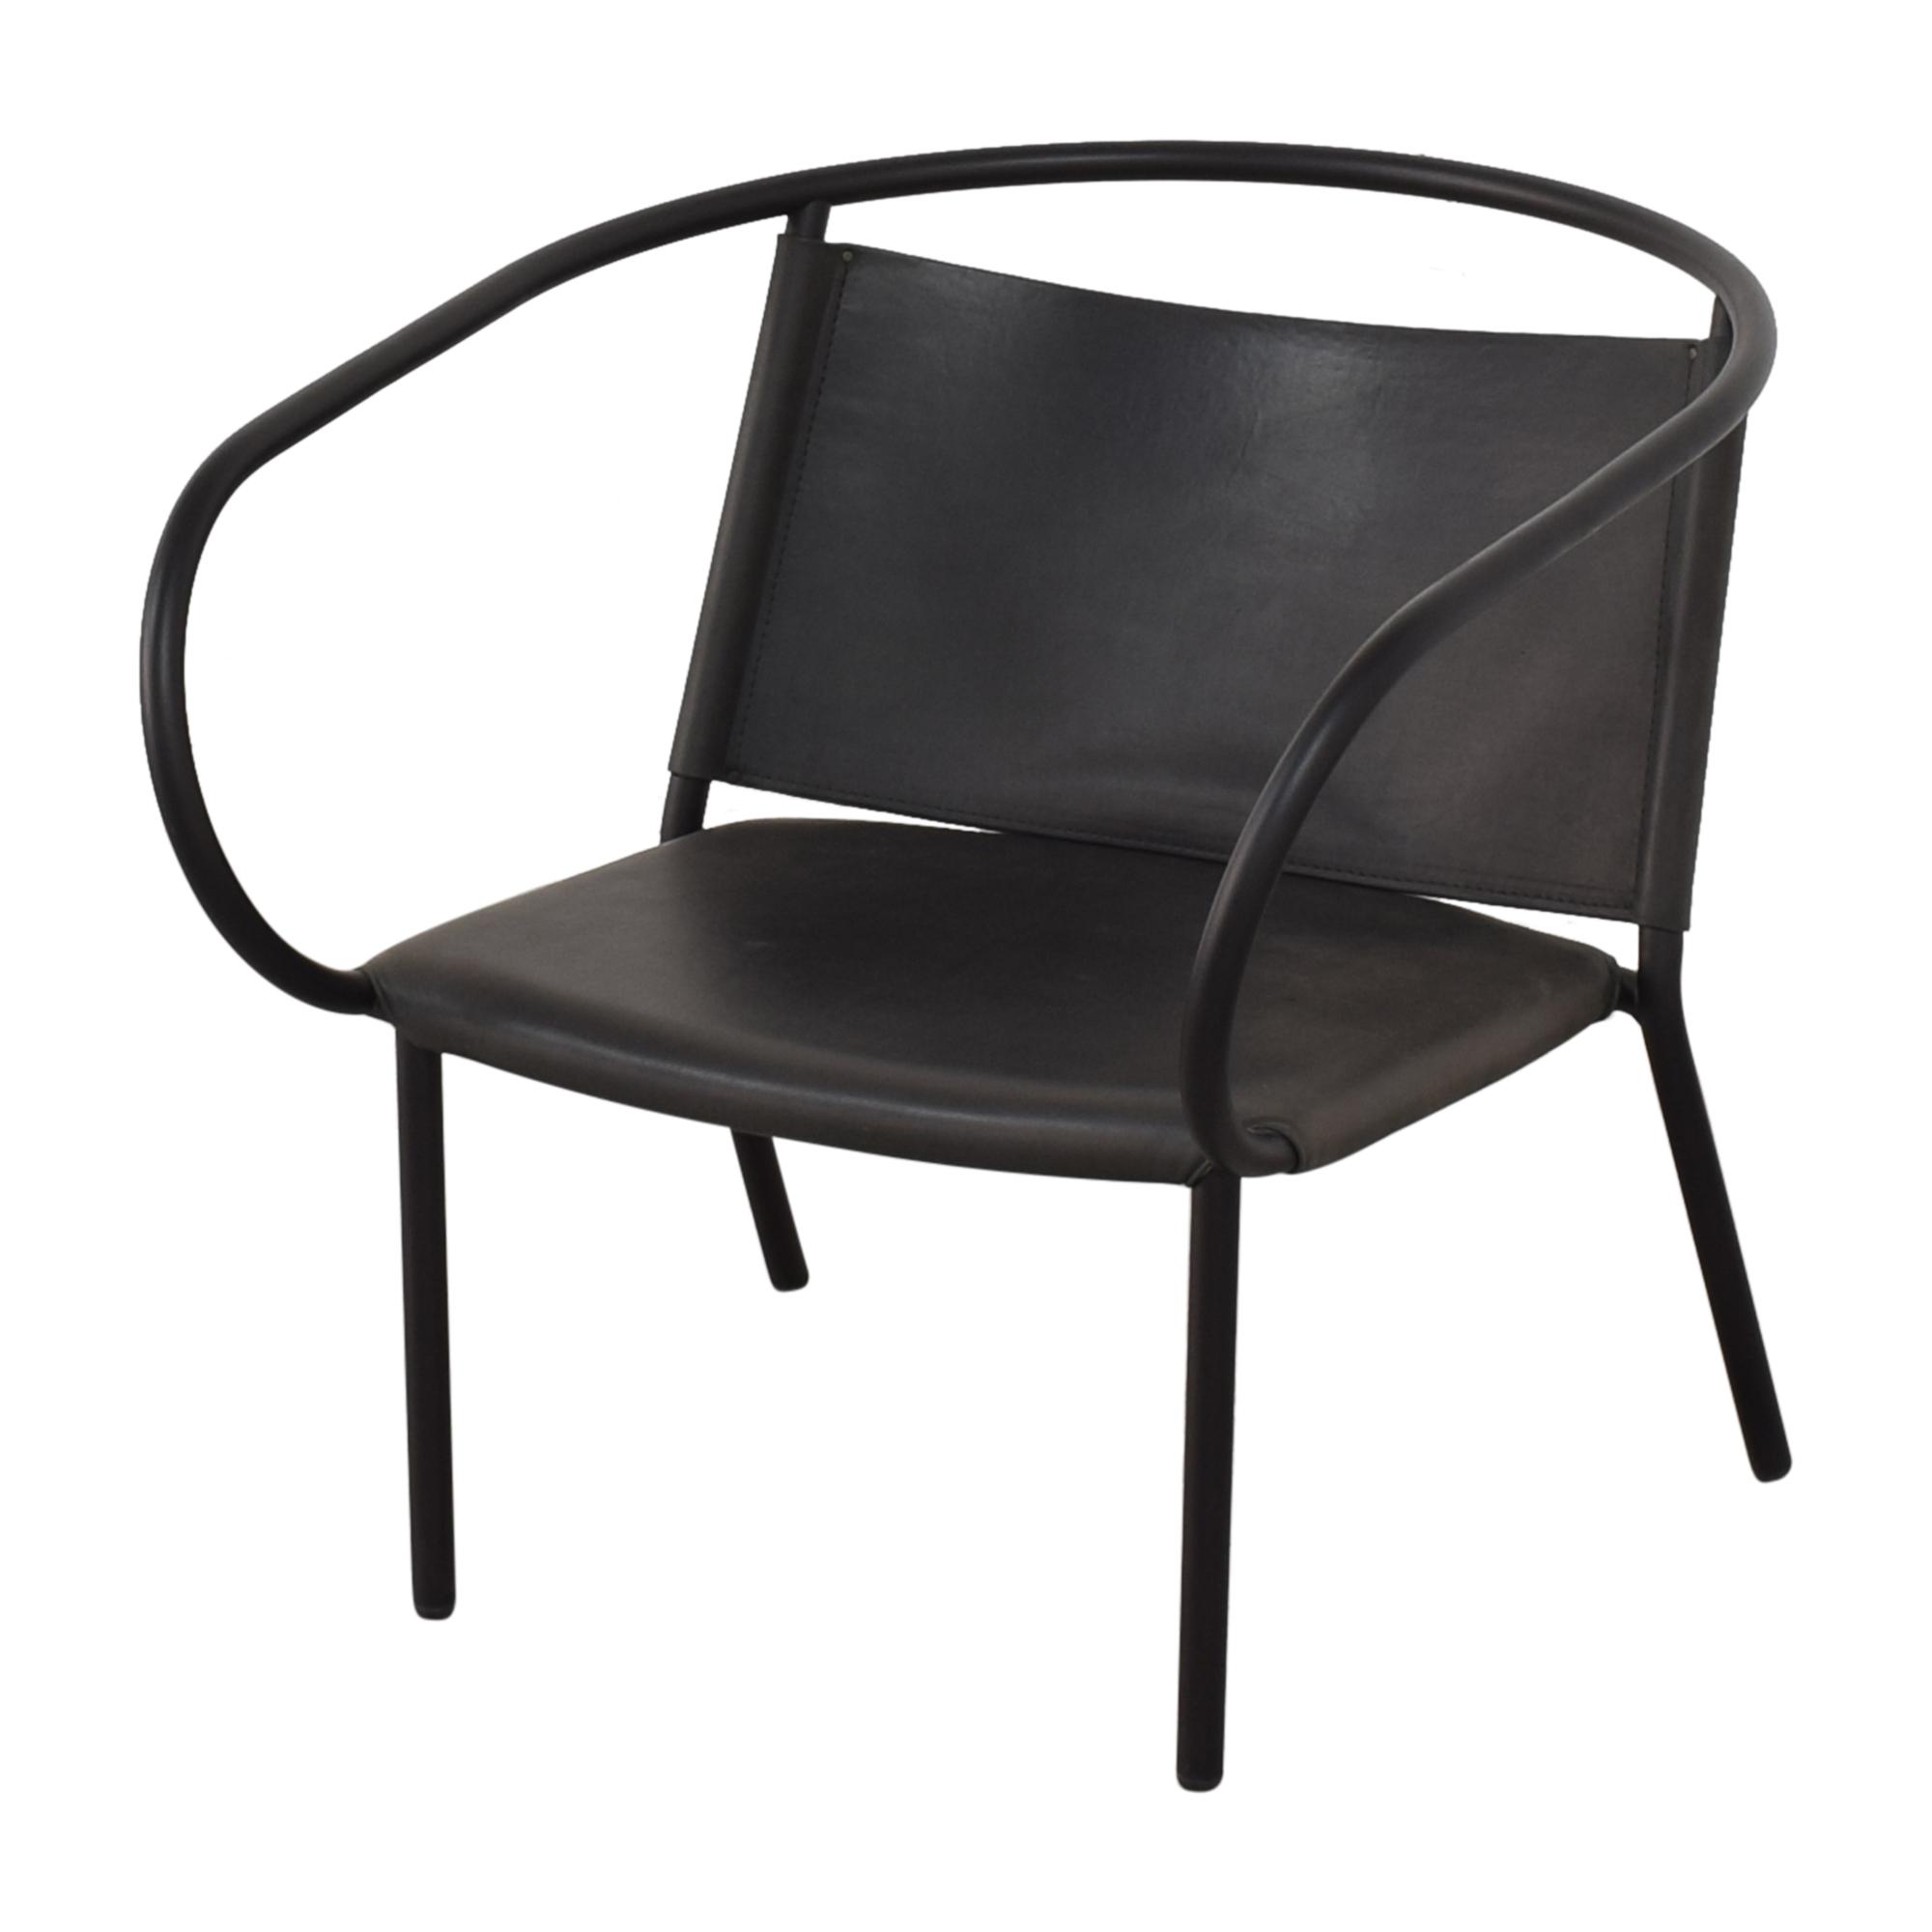 Menu Design Shop Menu Design Shop Afteroom Lounge Chair for sale